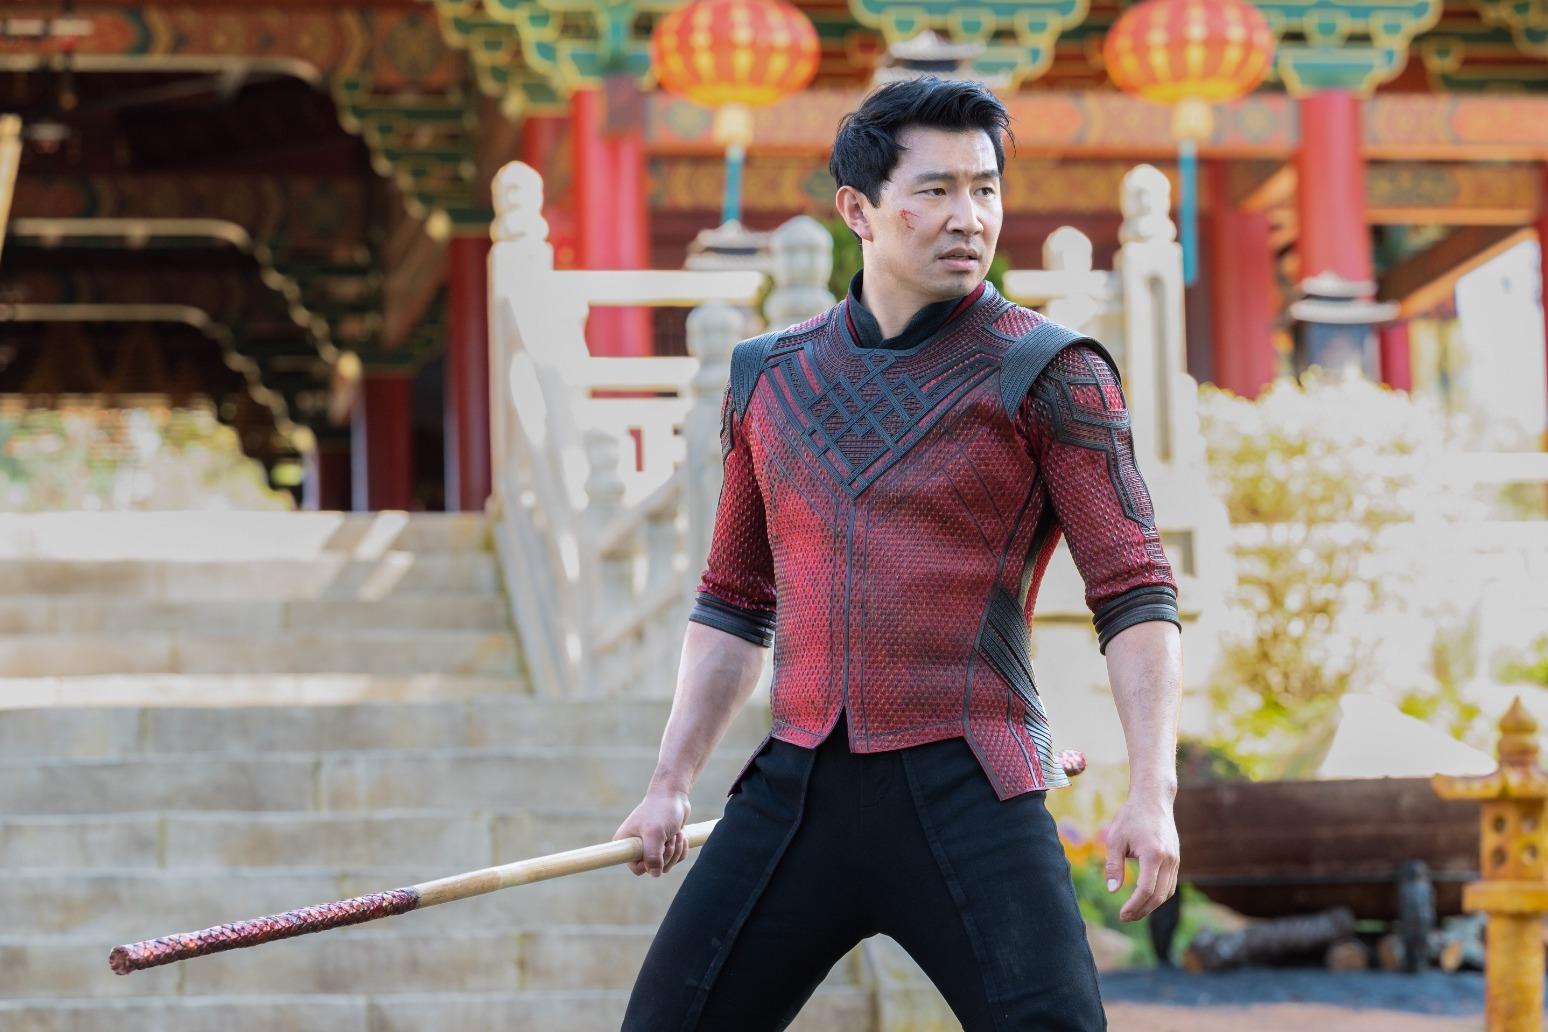 Disney's 2021 films to debut exclusively in cinemas